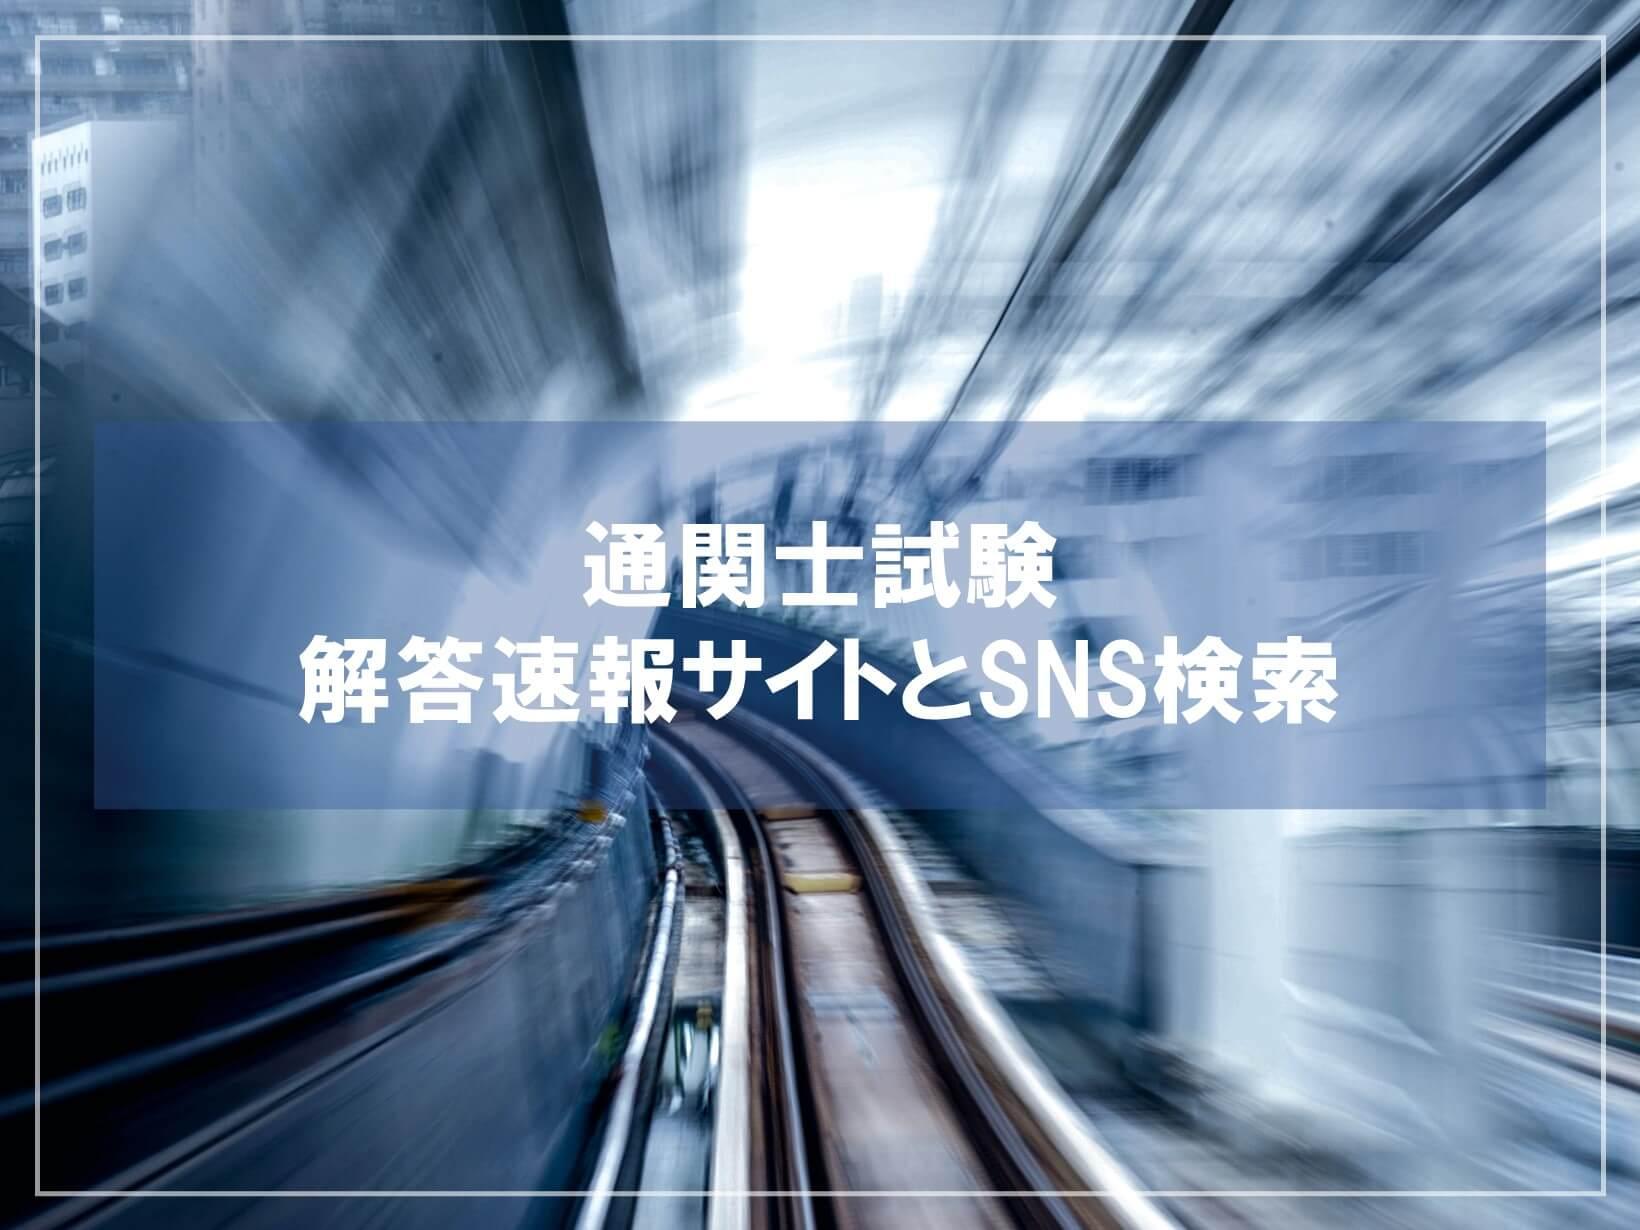 通関士試験 解答速報サイトとSNS検索